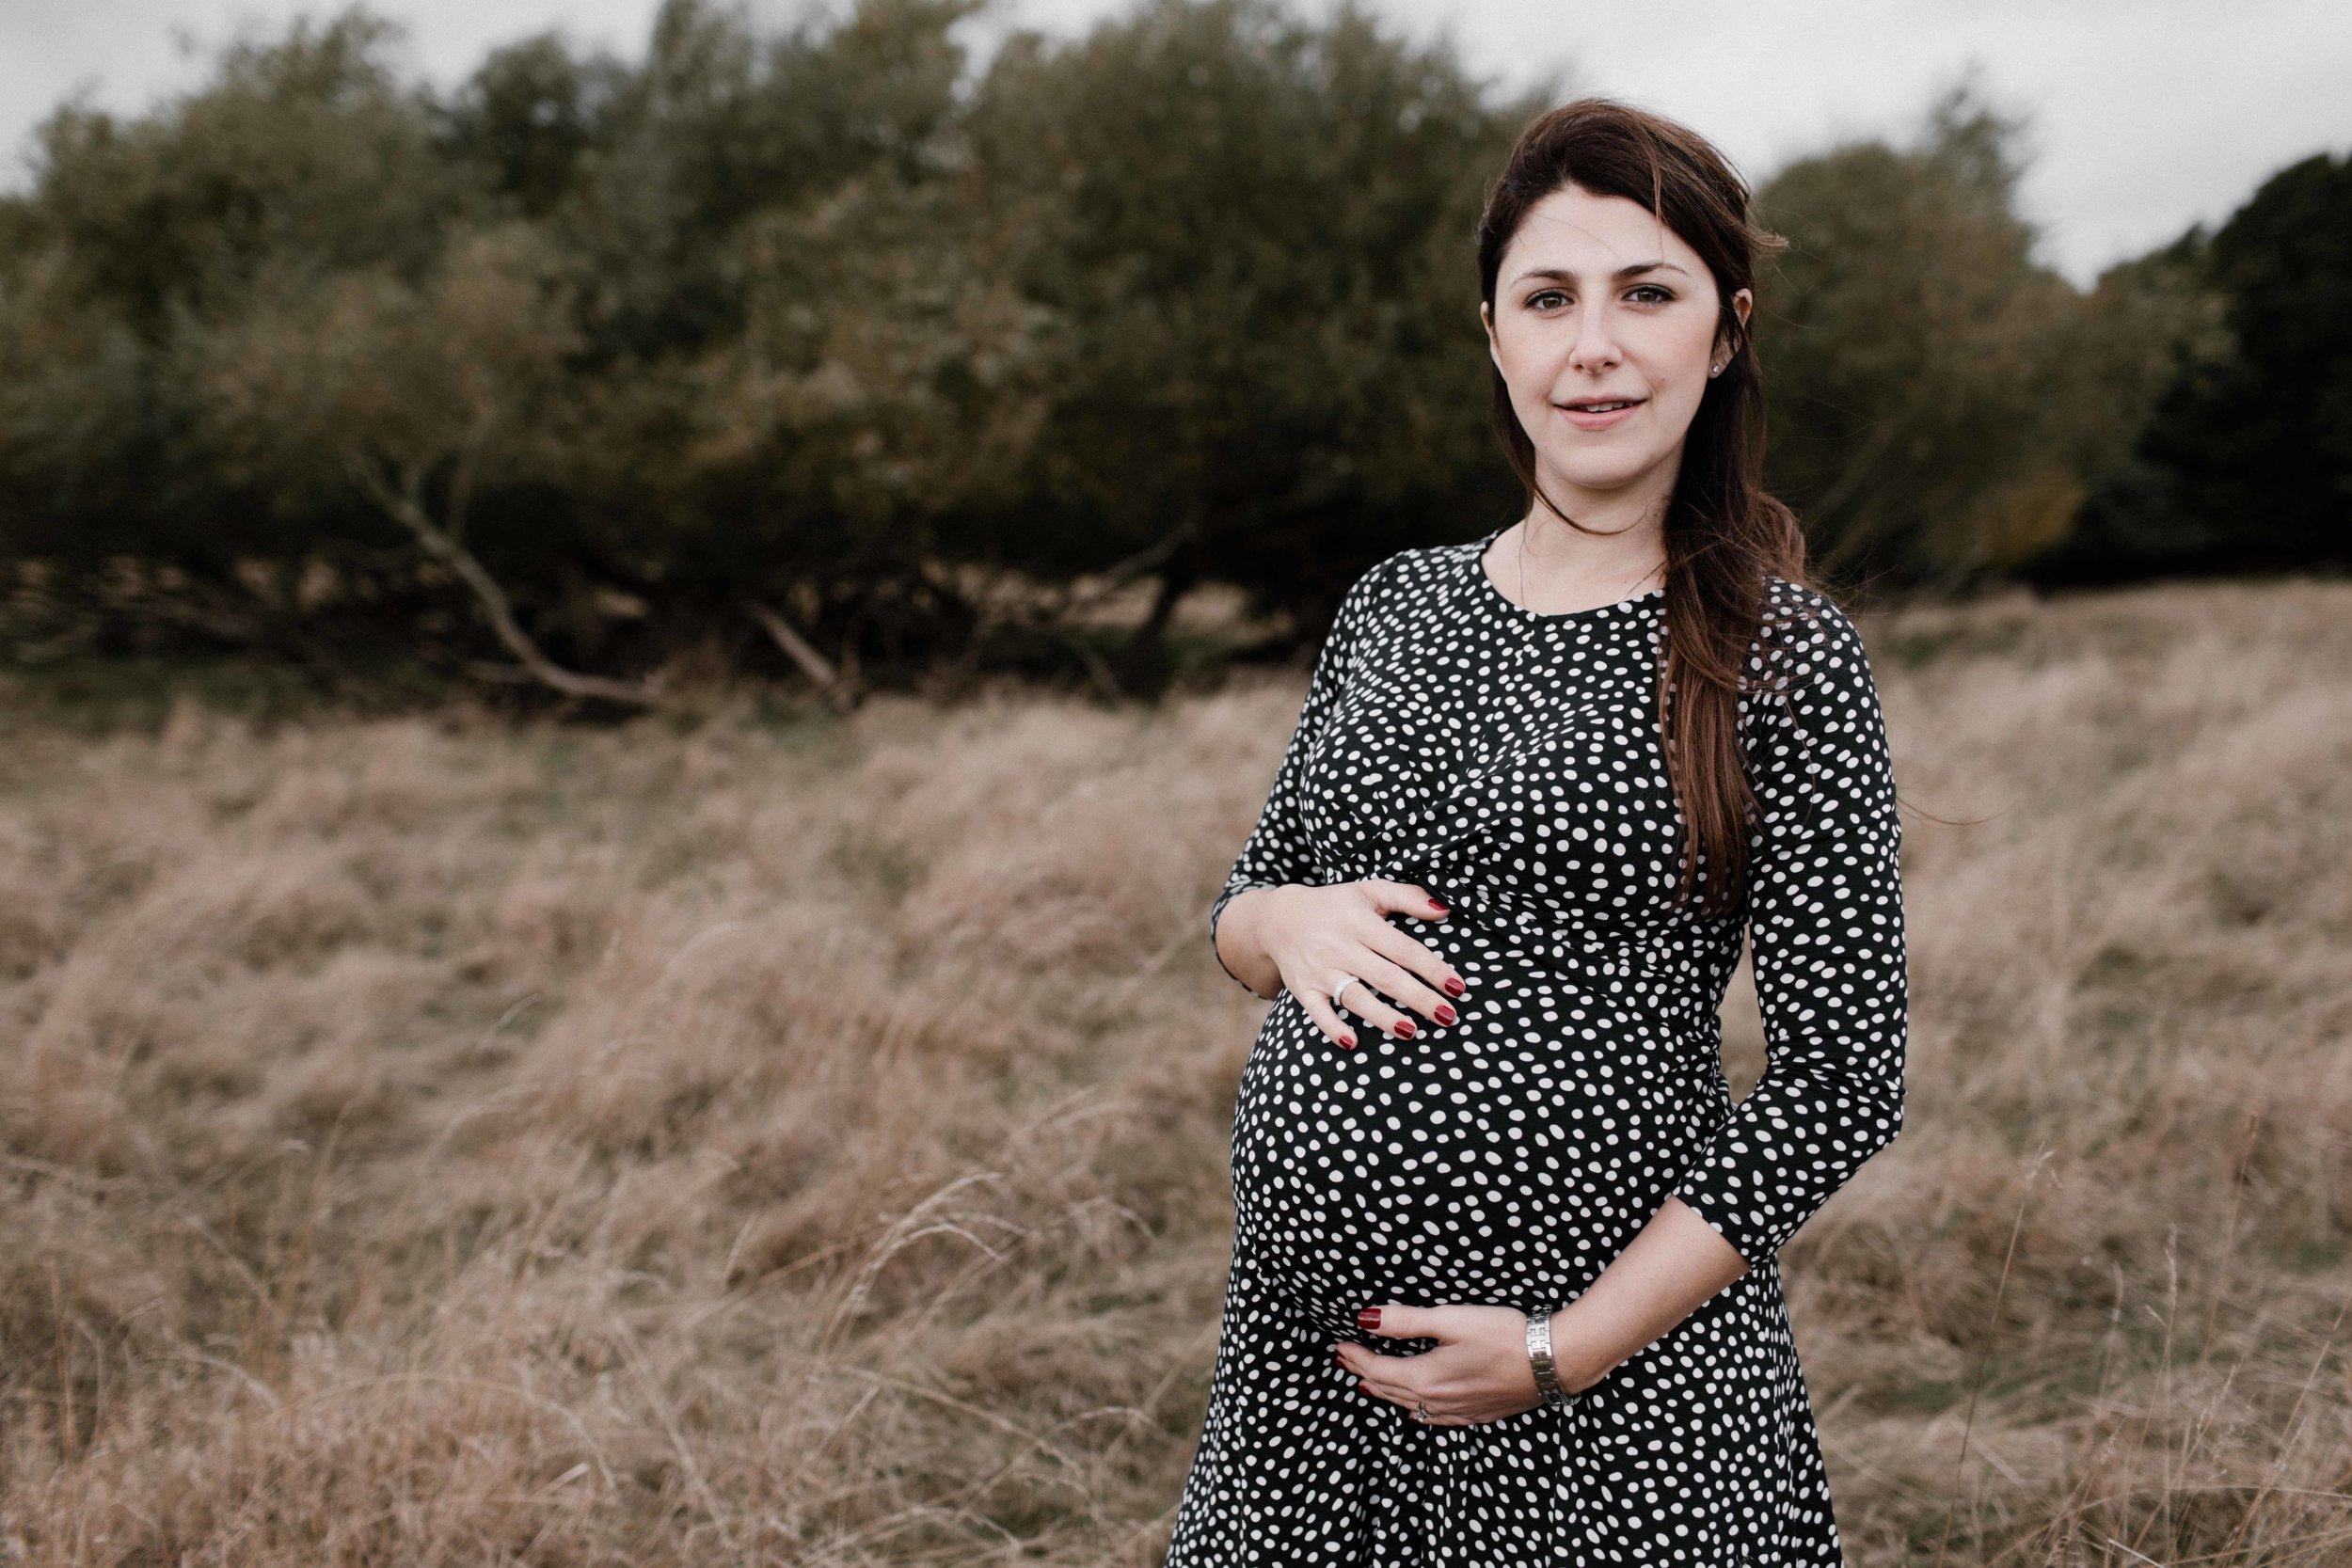 pregnancy_maternity_photographer_Richmond_littlekinphotography-7.jpg